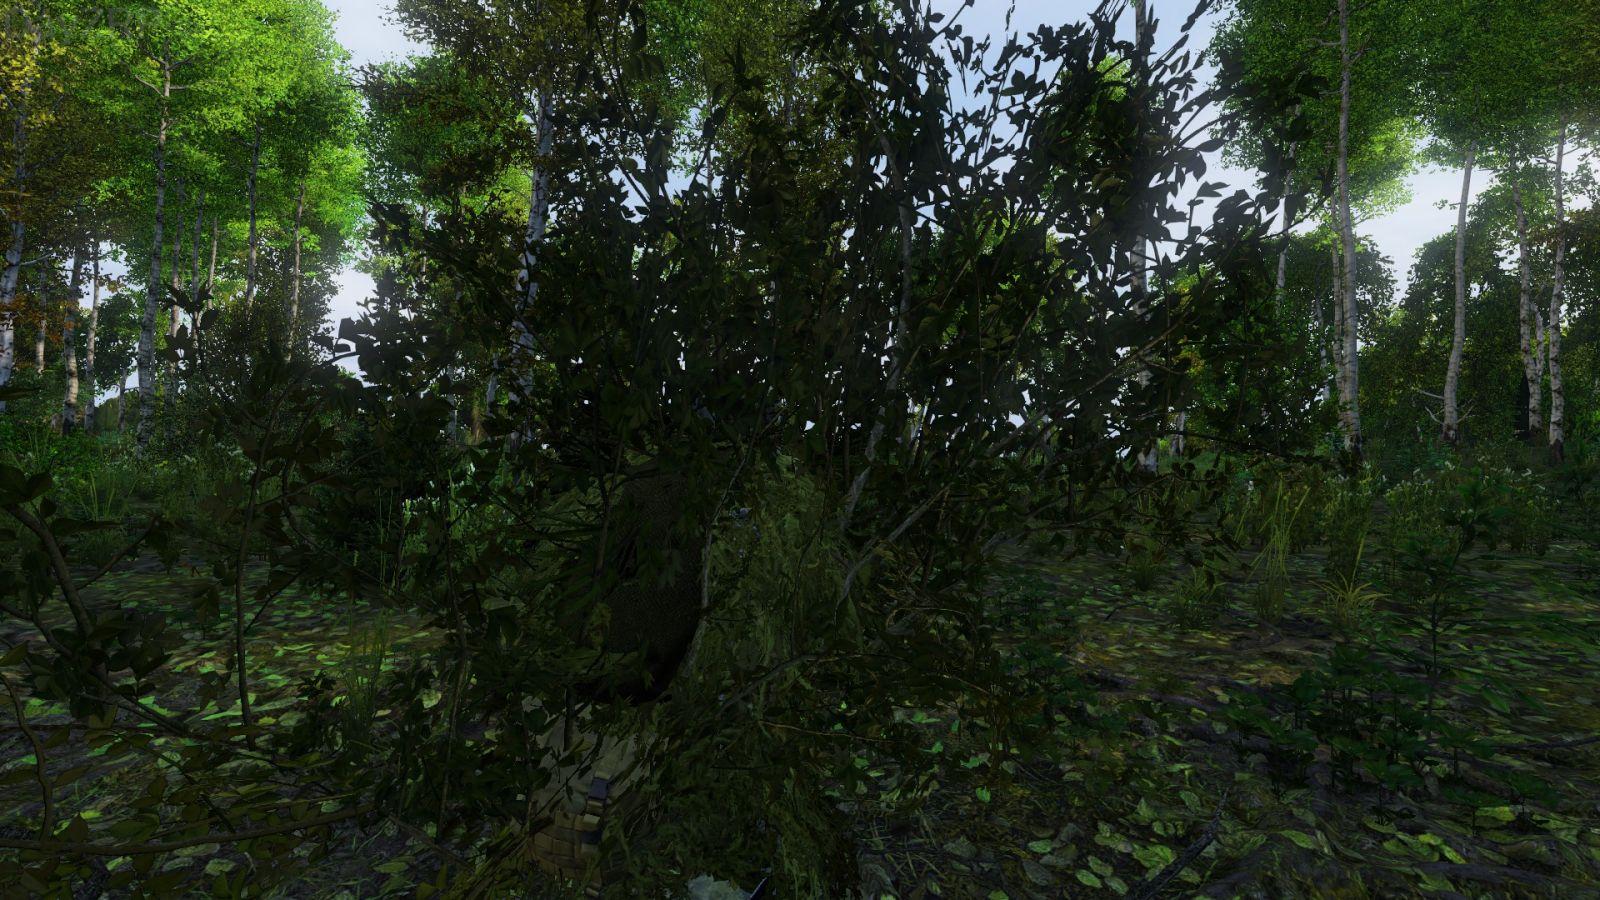 I am a bush!